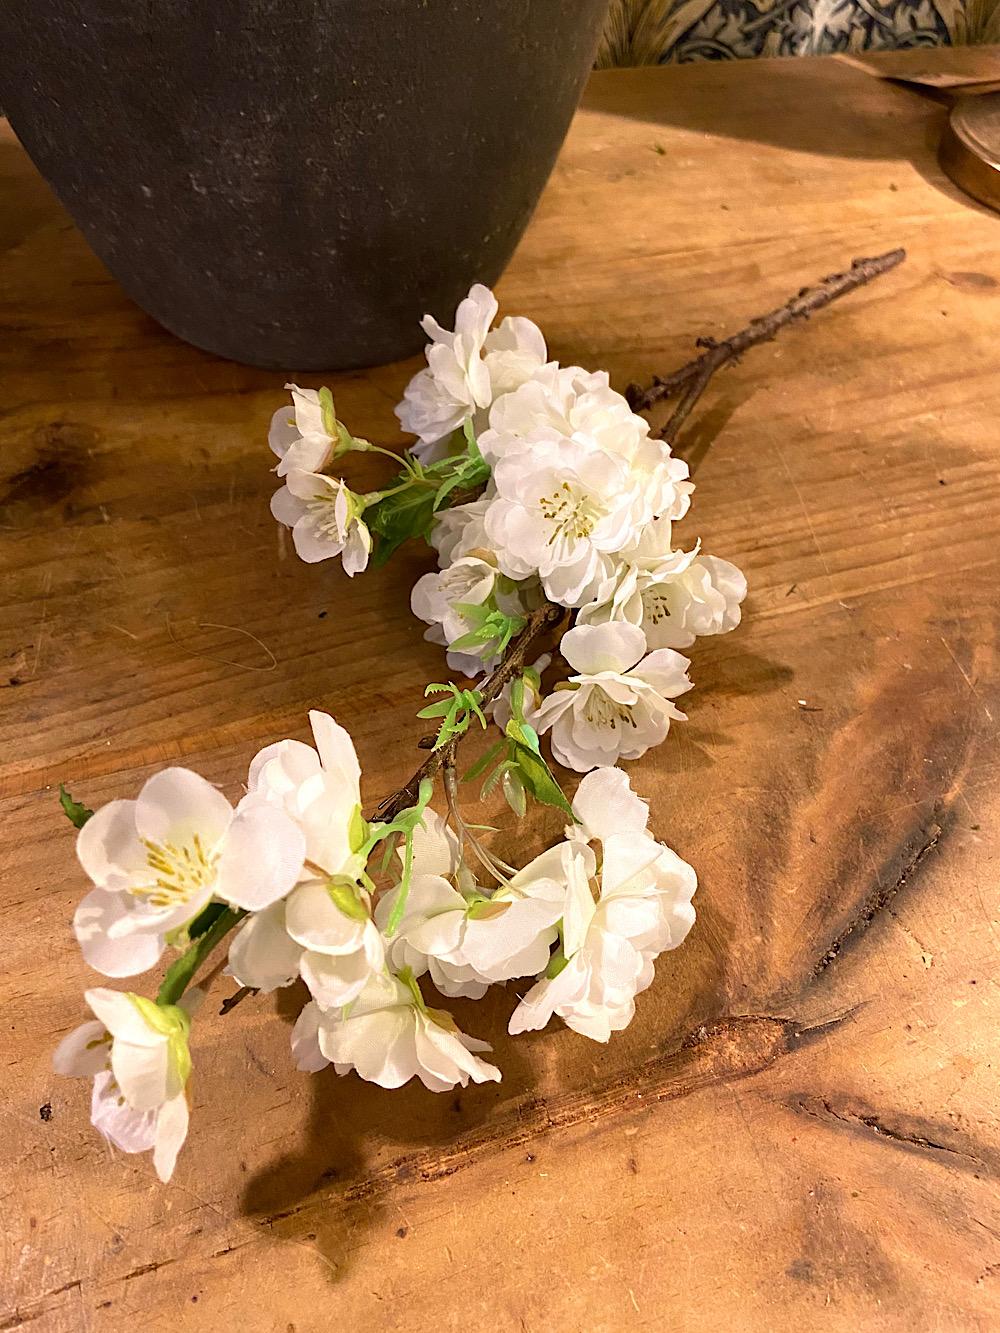 Mr Plant Kirsikanpuun oksa